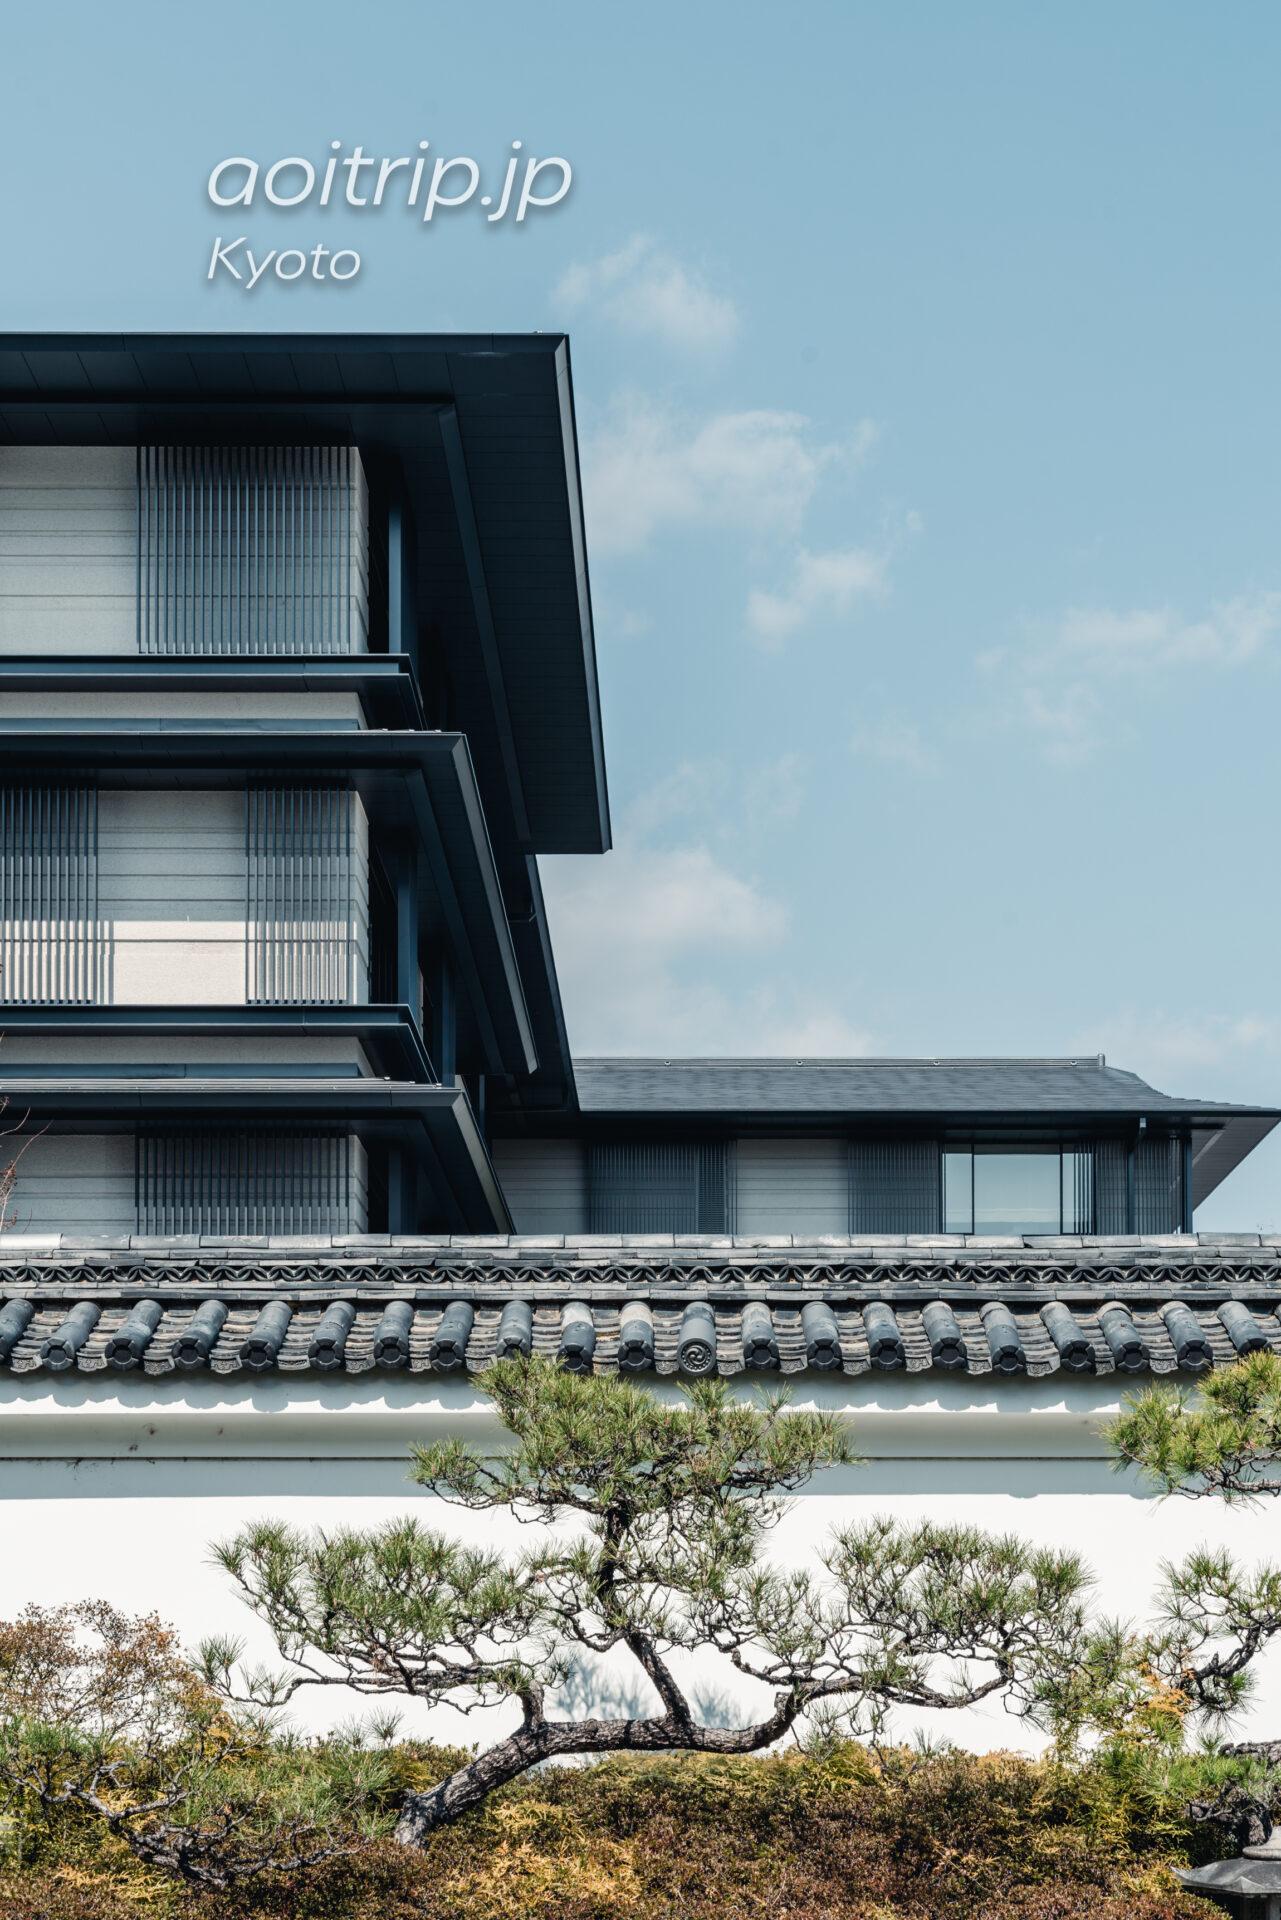 HOTEL THE MITSUI KYOTO 宿泊記 ホテル ザ 三井京都